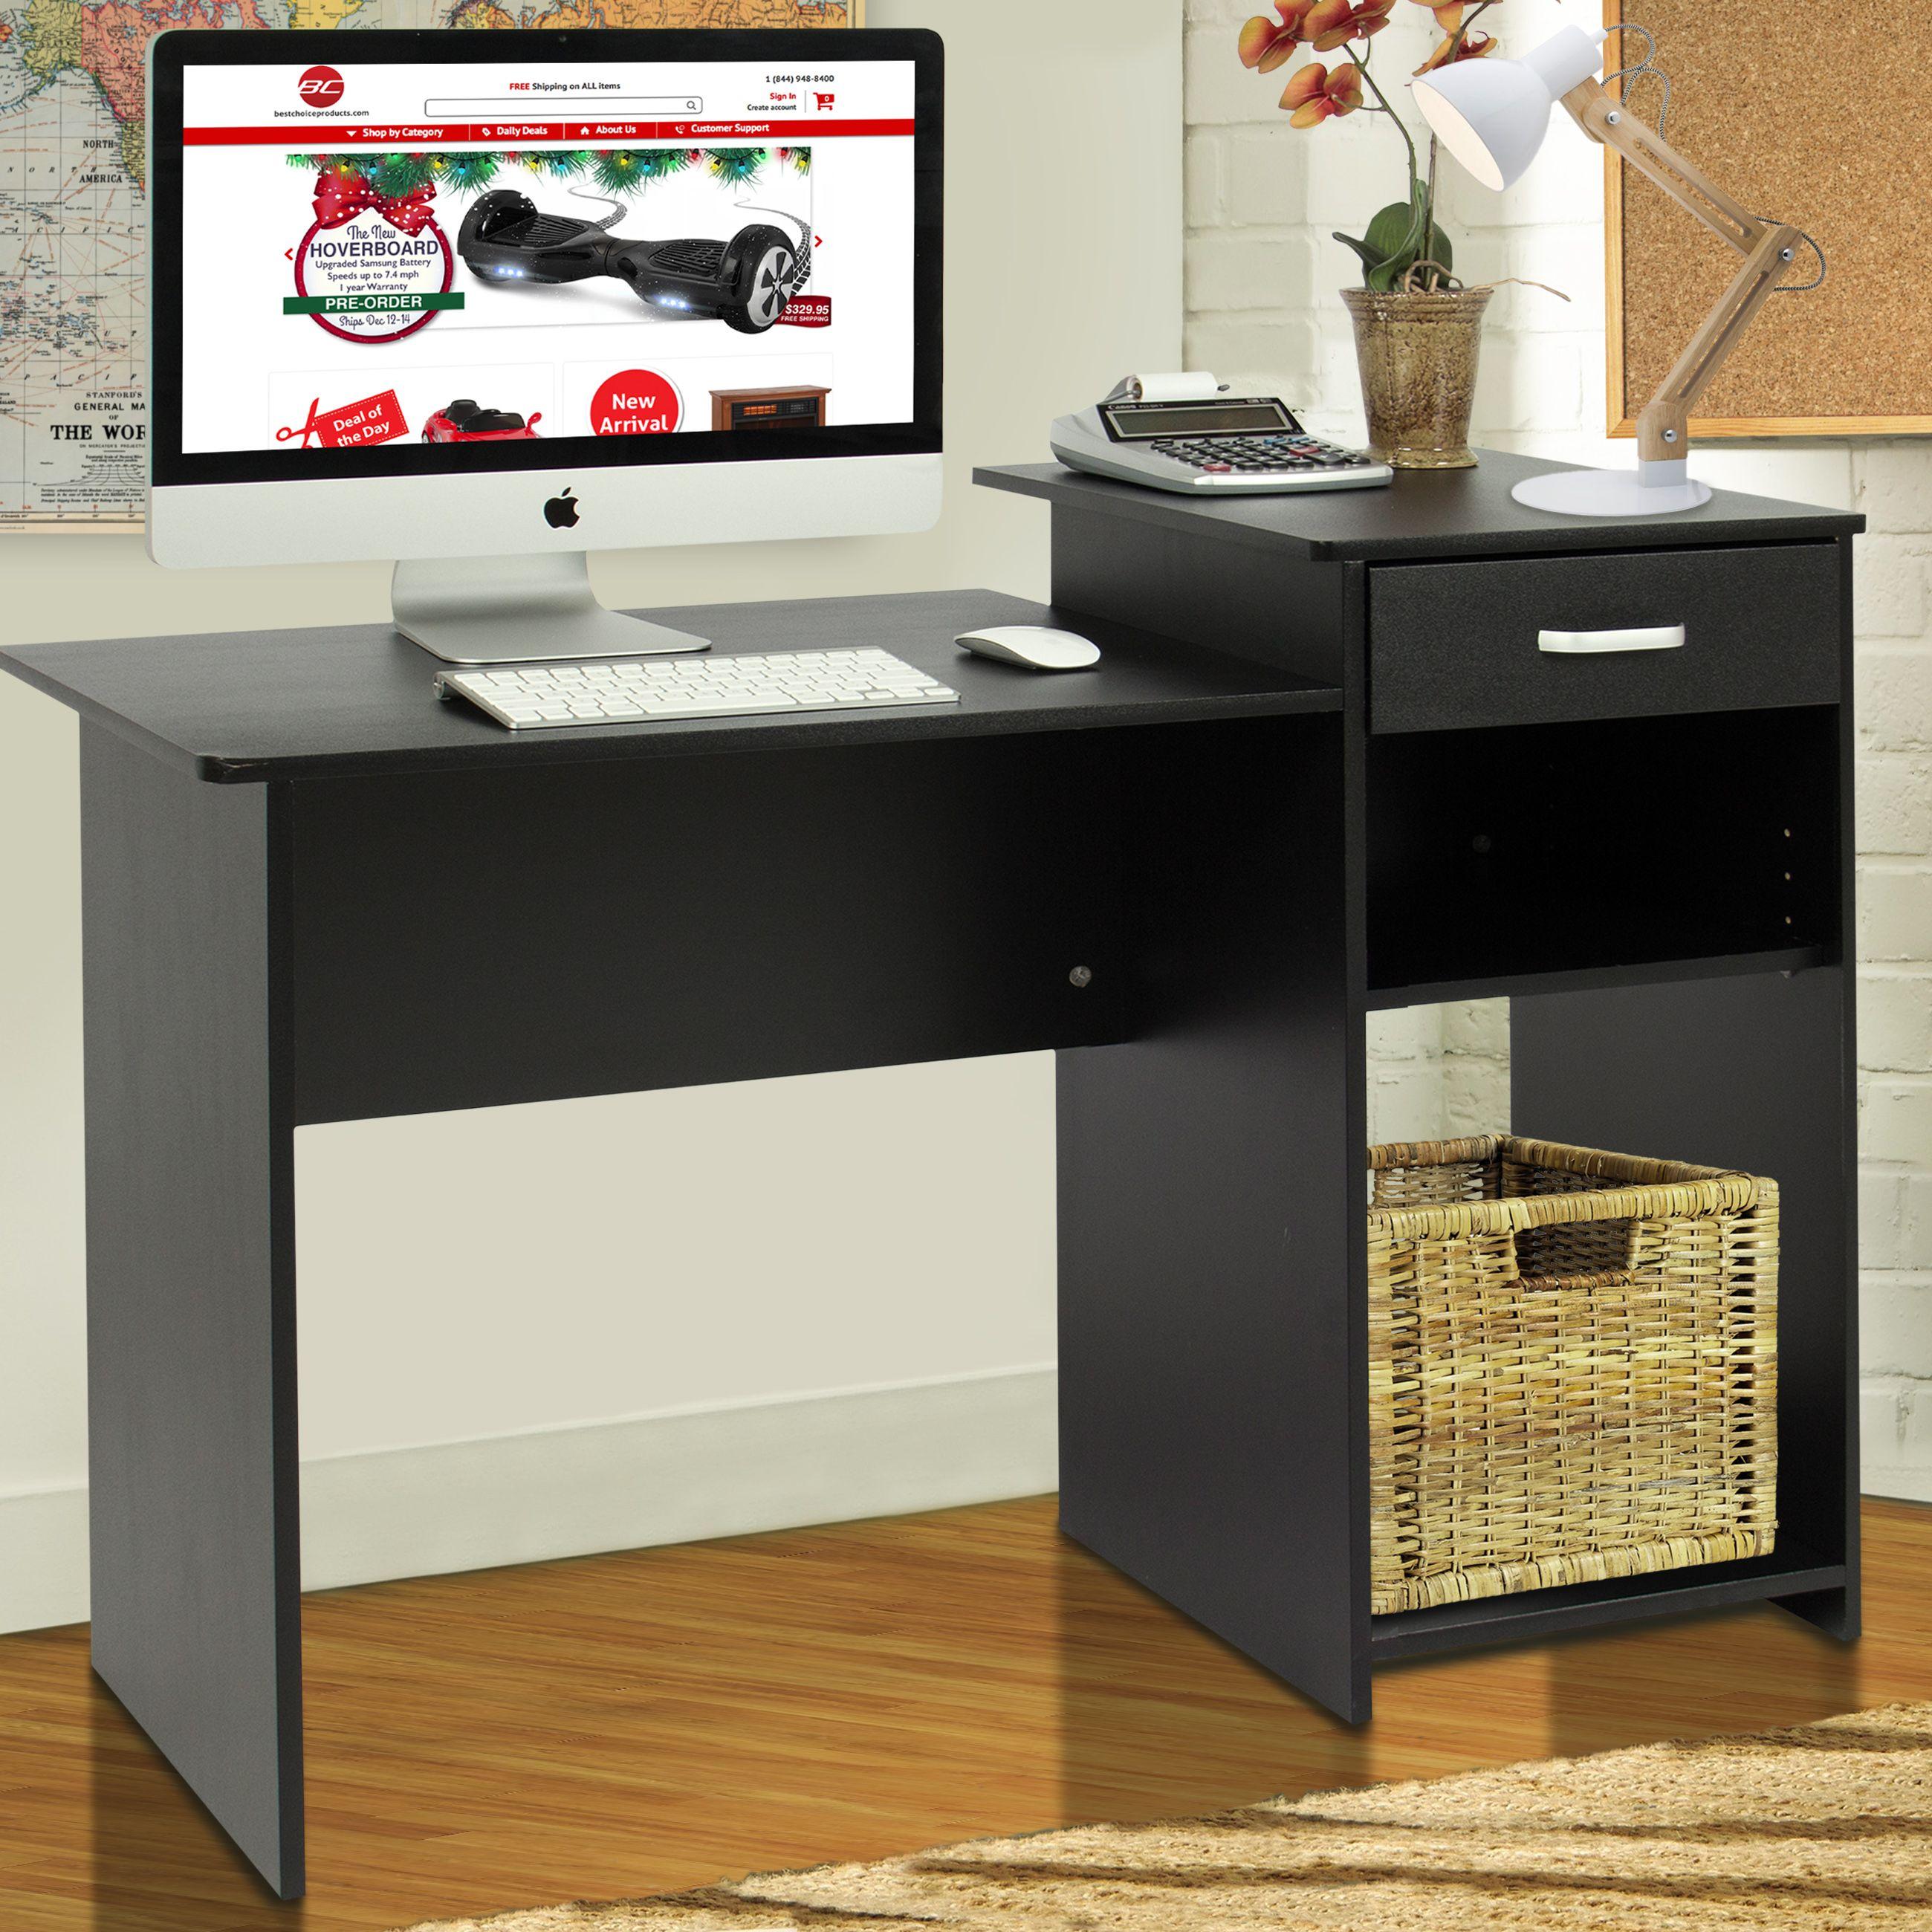 Bunk Beds Loft With Desk Wayfair Twin Low Bed Storage Best Kids